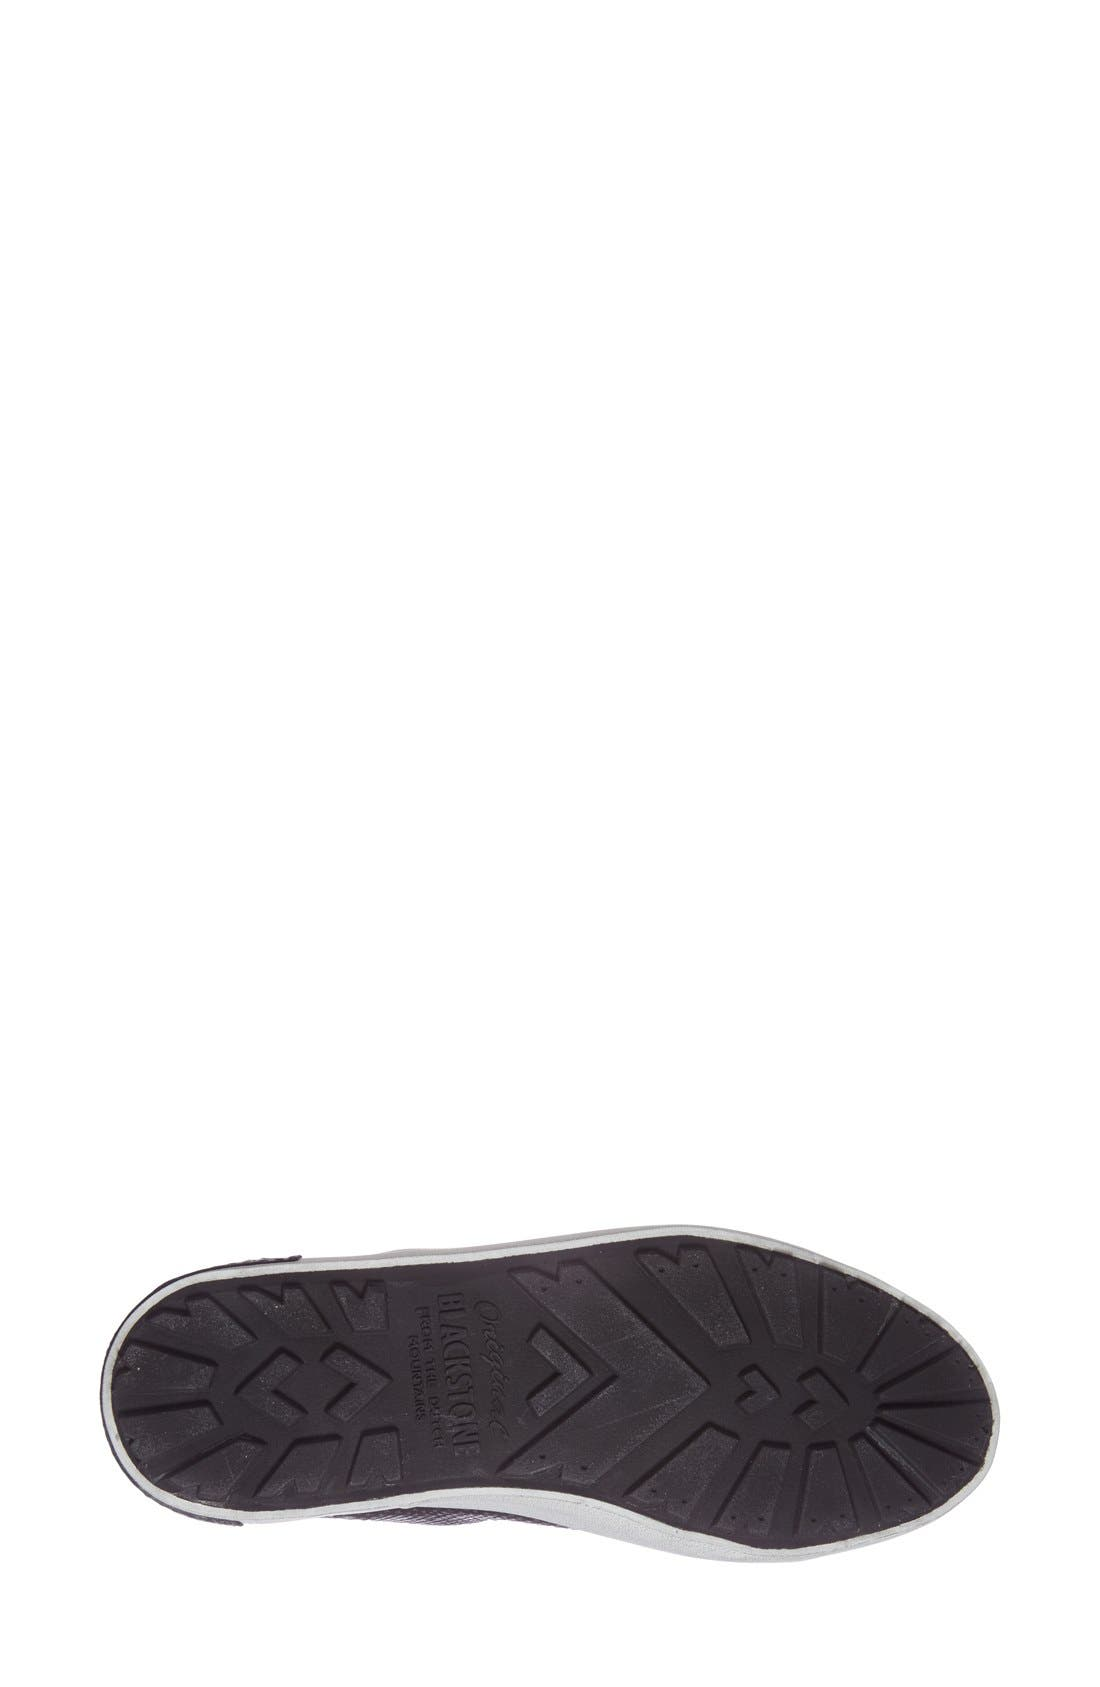 Alternate Image 4  - Blackstone 'KL57' High Top Sneaker (Women)